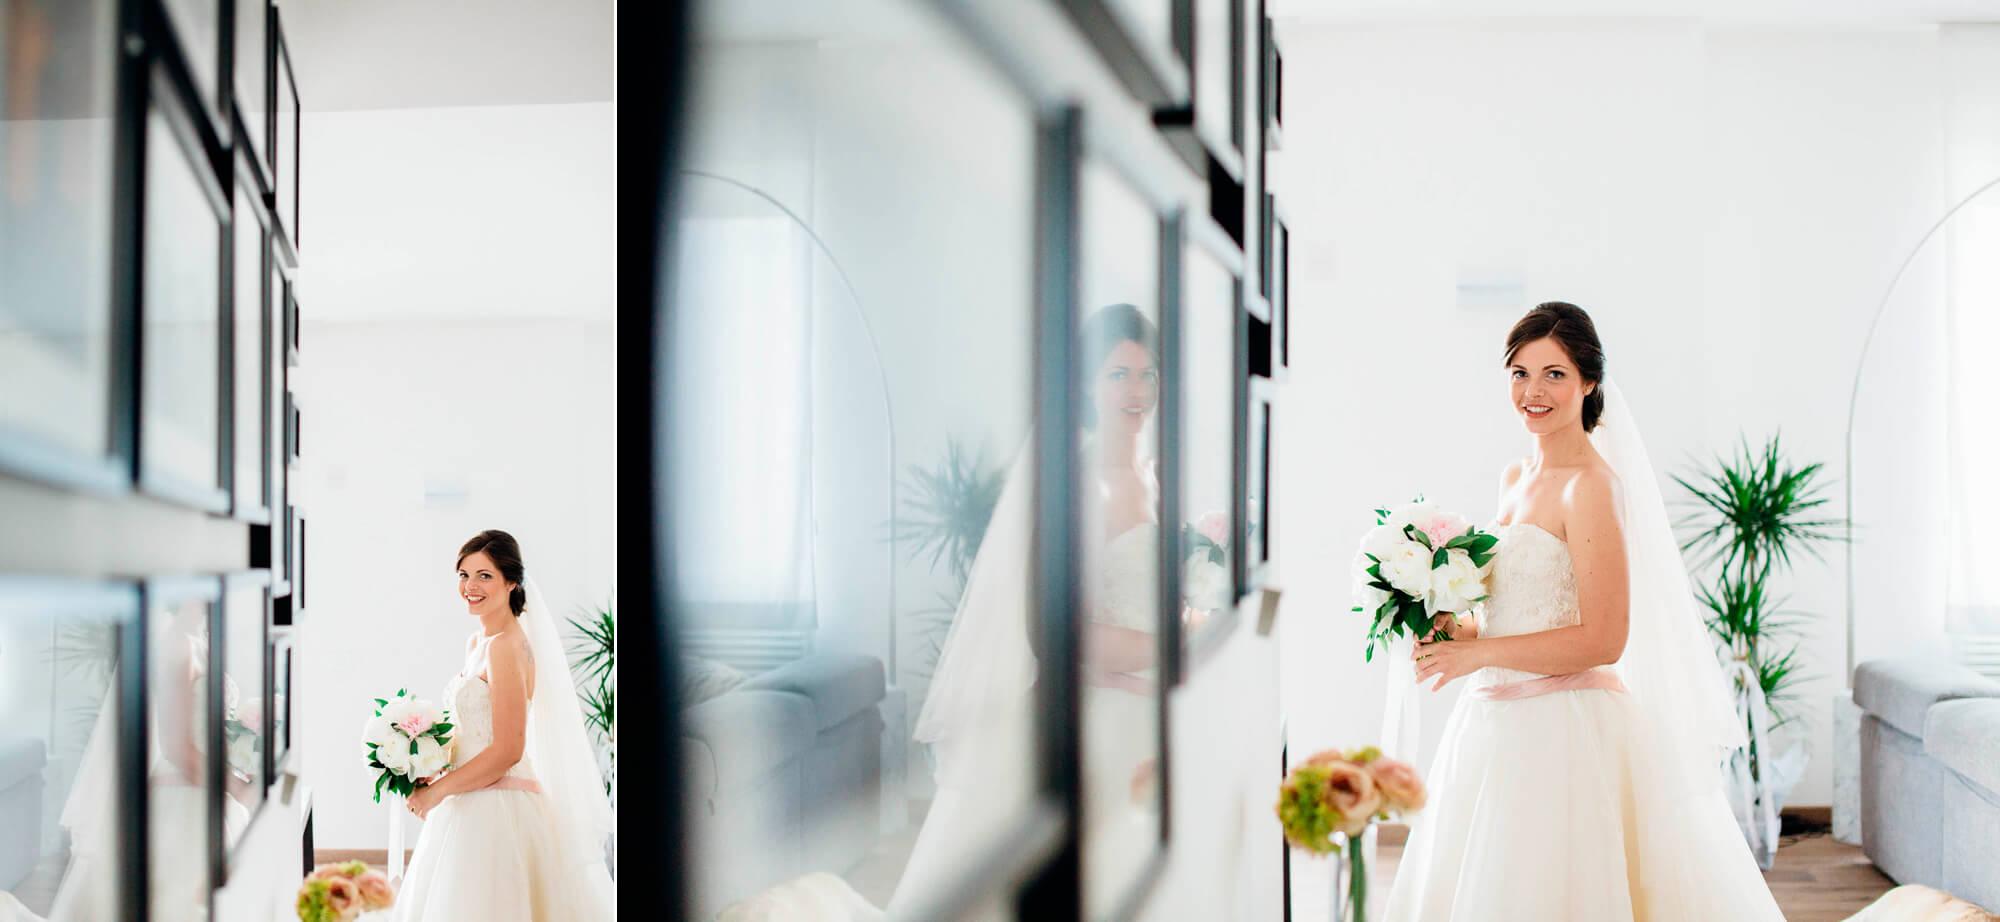 049-arezzo-wedding-photographer.jpg